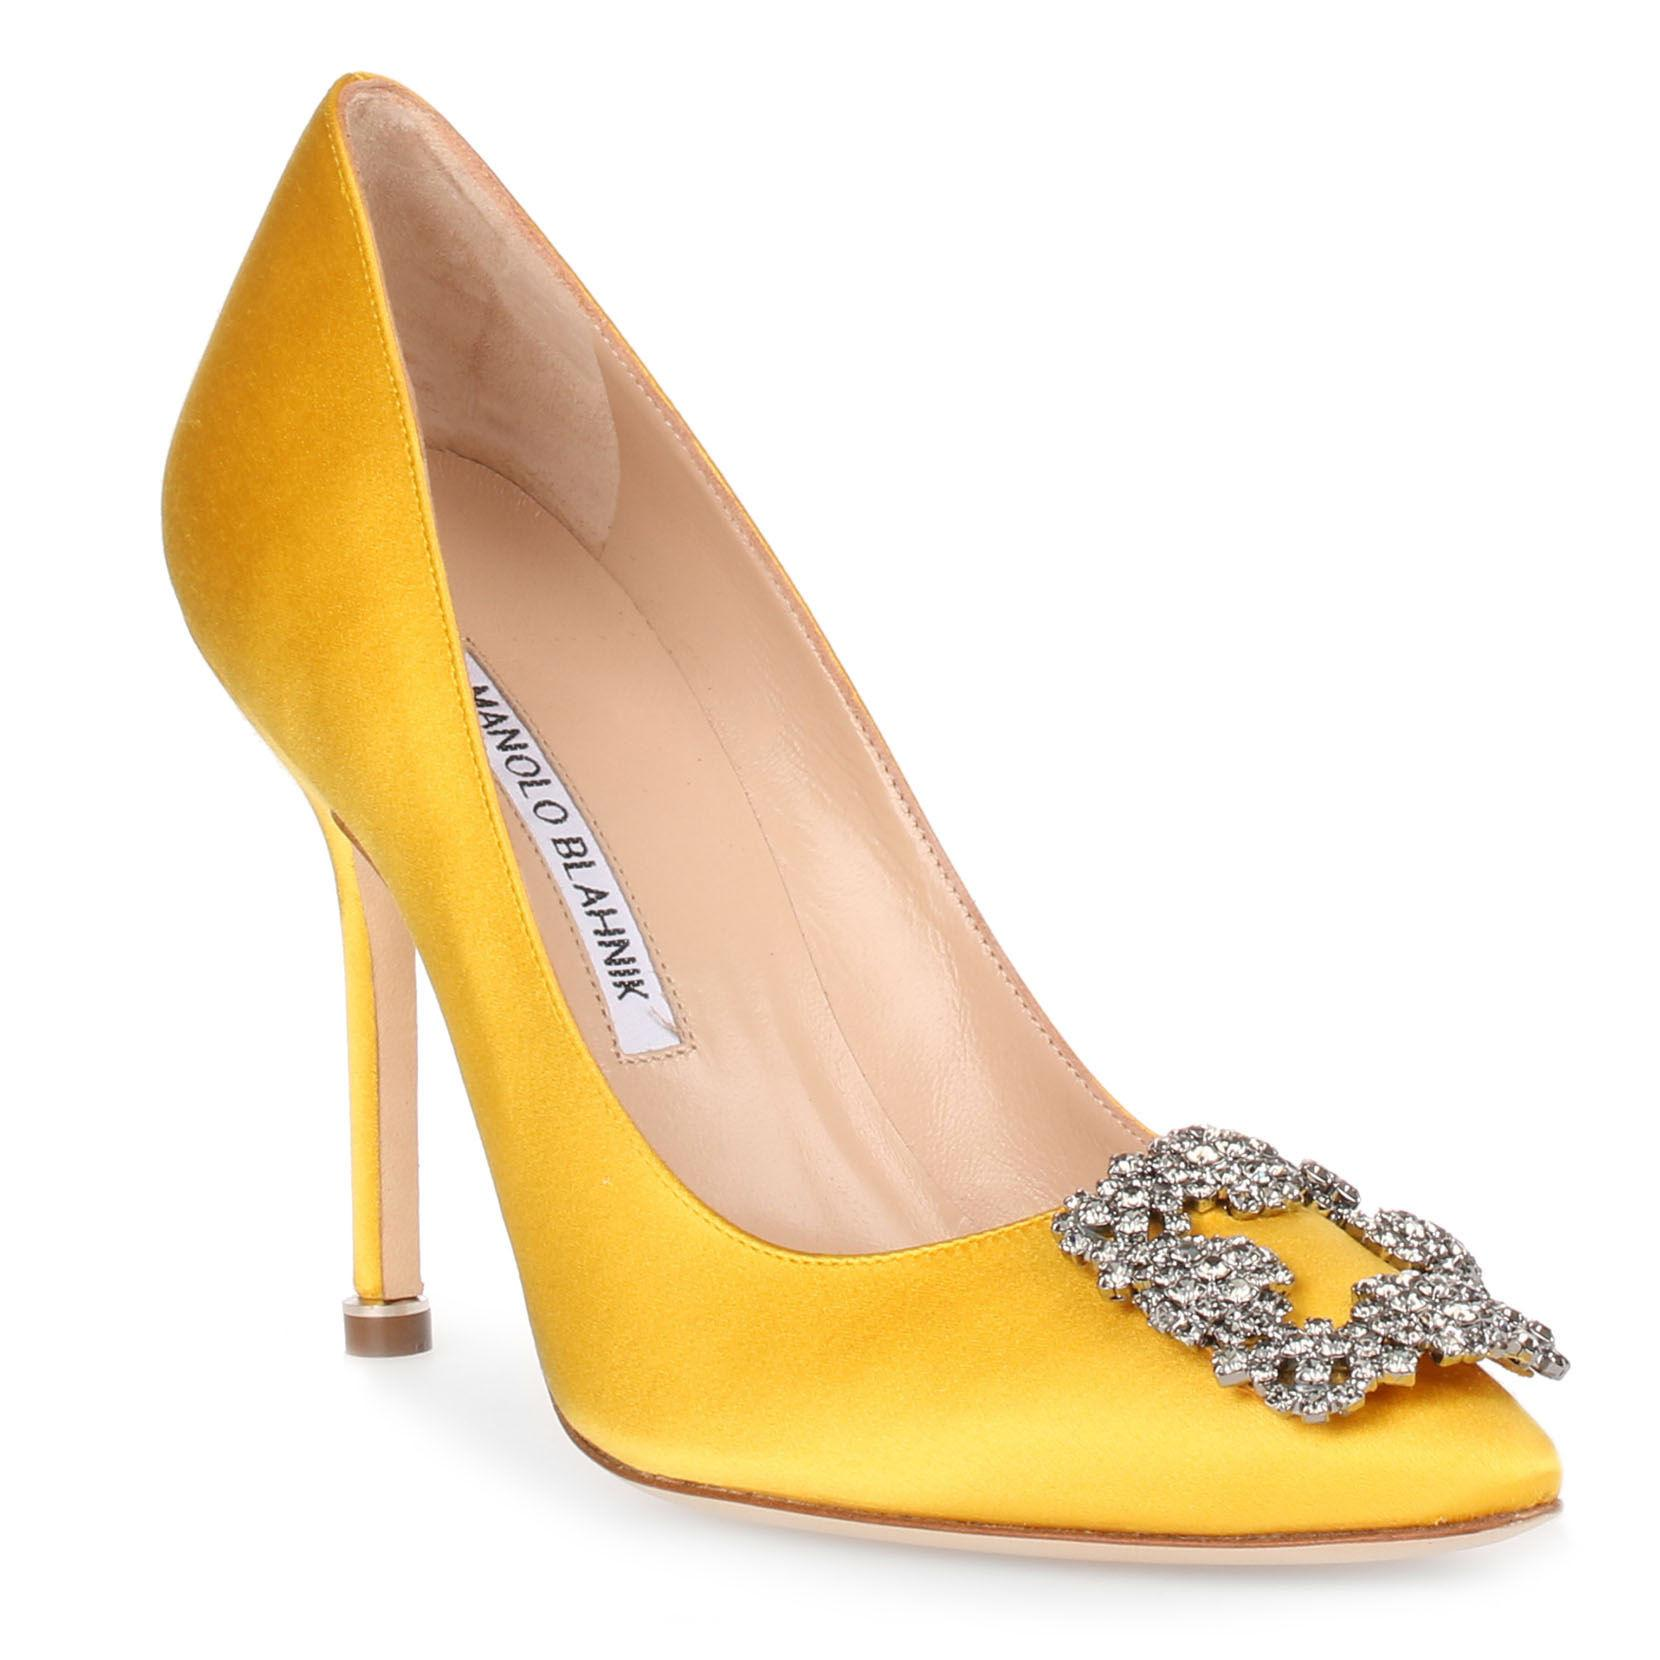 49257f74121 Lyst - Manolo Blahnik Hangisi 105 Yellow Satin Pump in Yellow